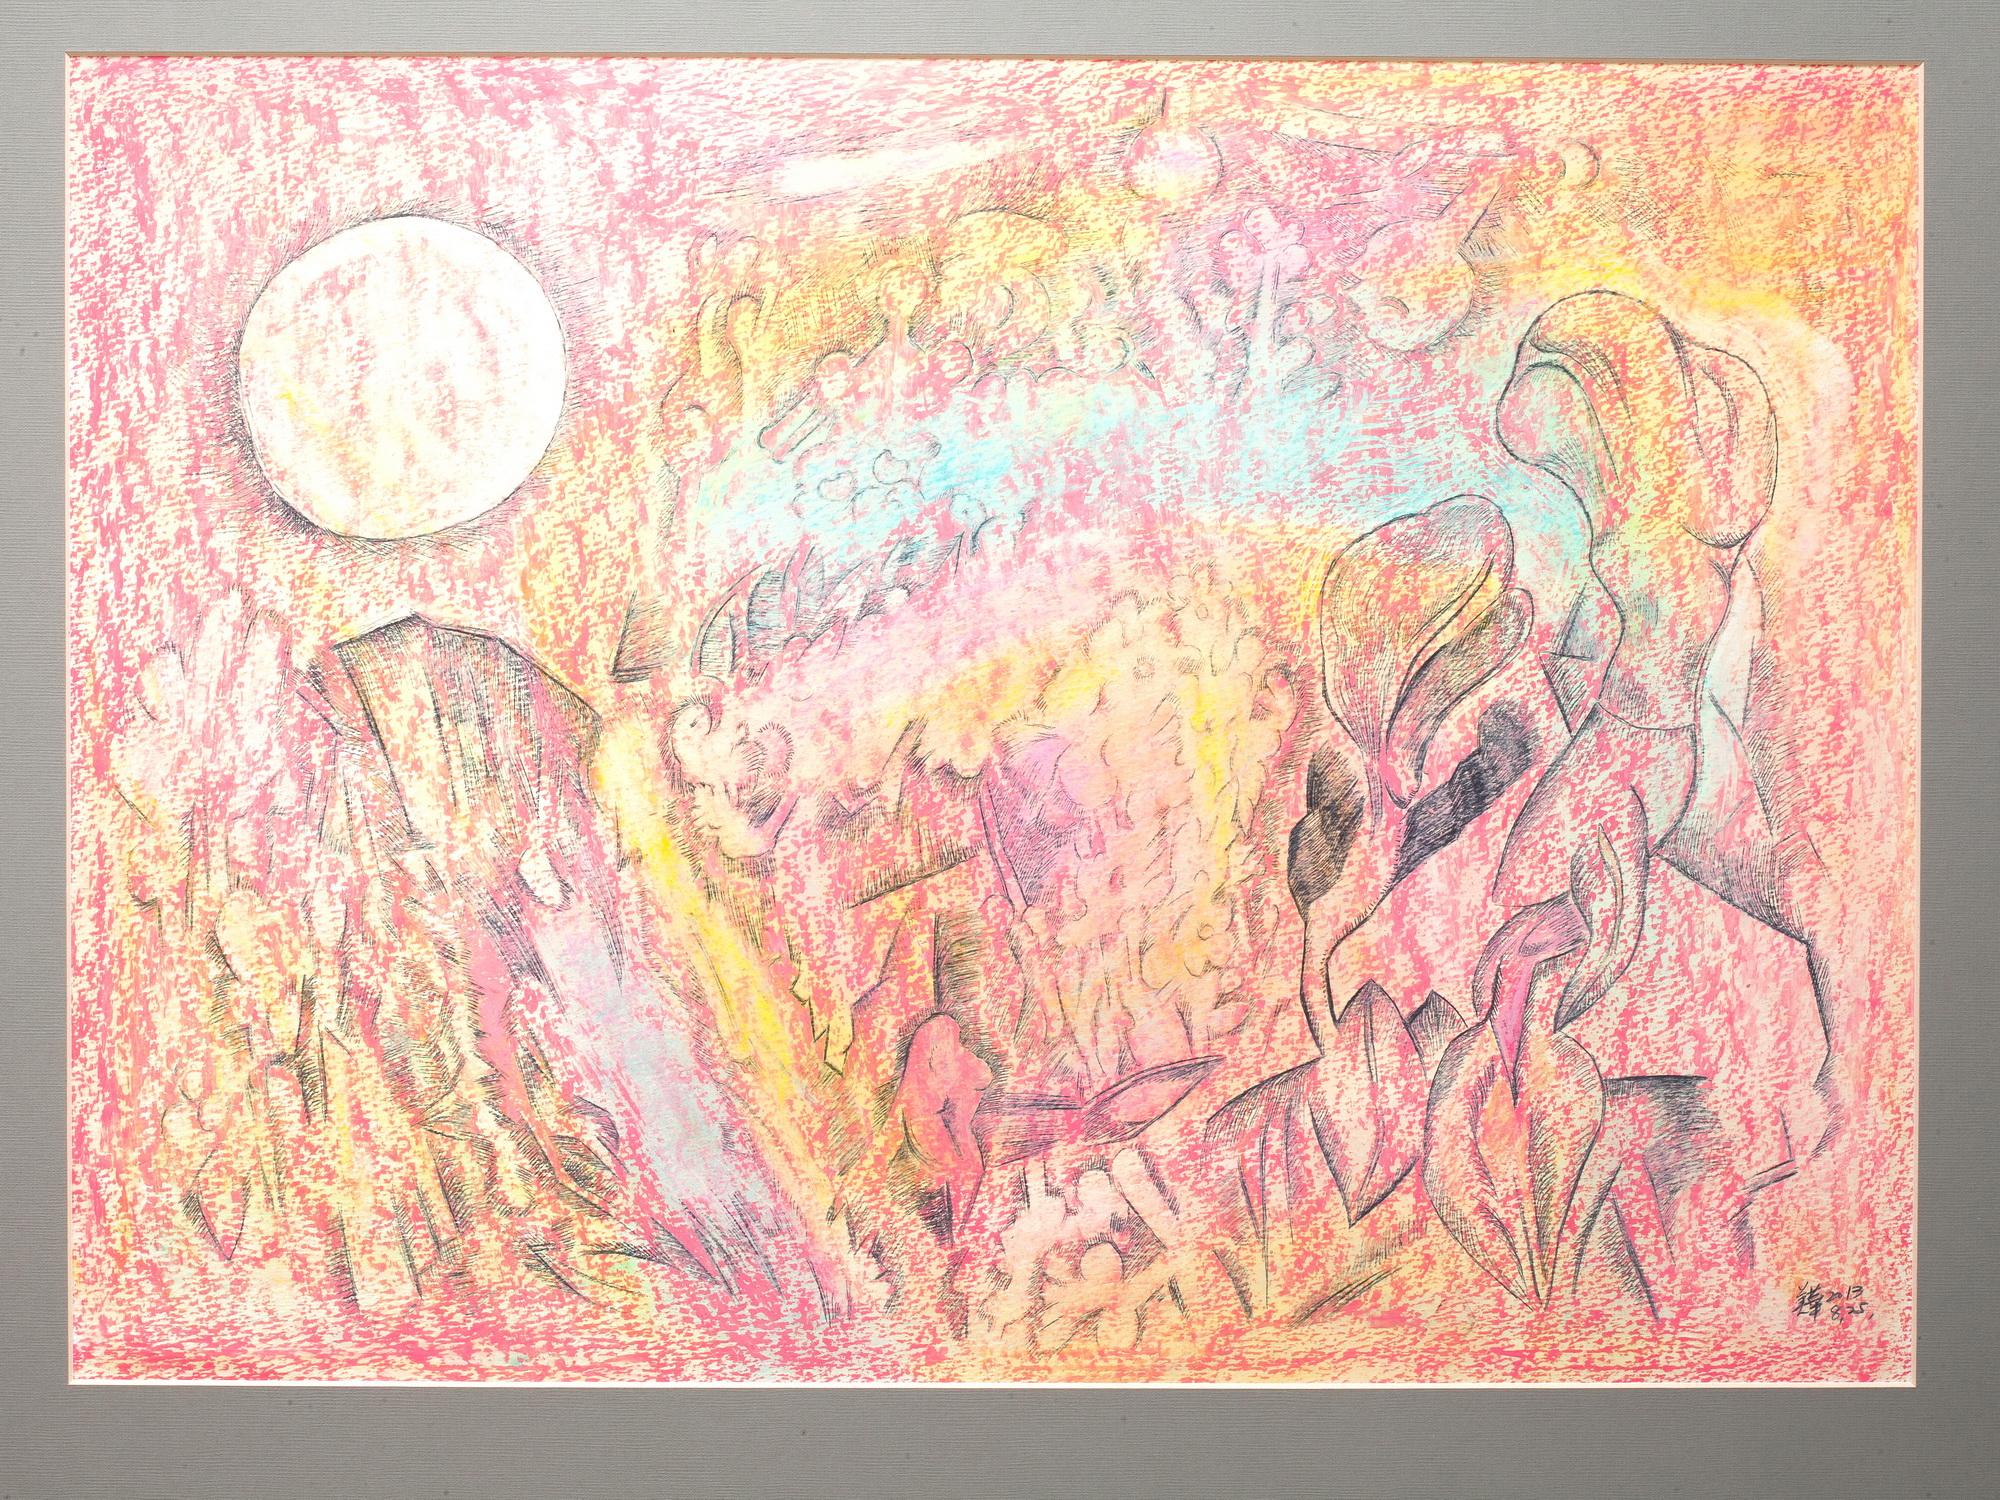 A309 異花園1 紙.粉彩.鉛筆 53x38cm2013